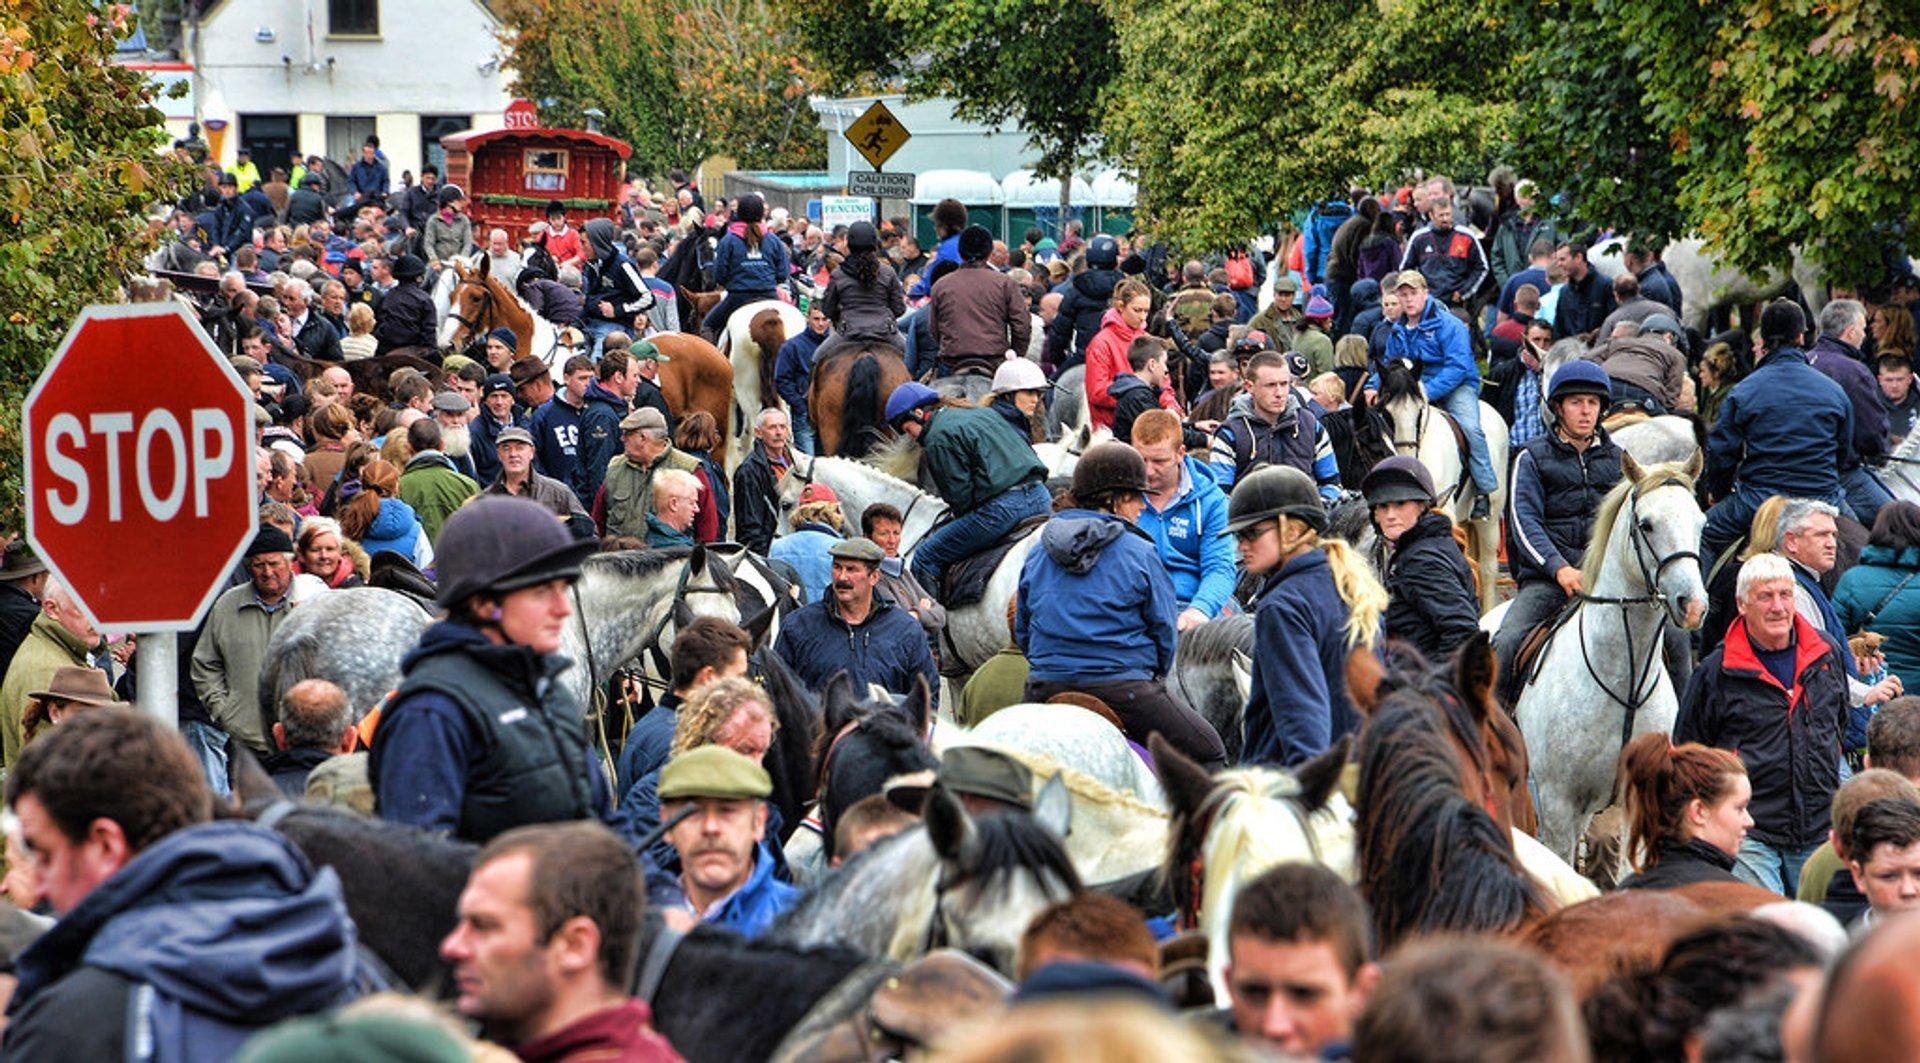 Ballinasloe Horse Fair in Ireland - Best Season 2019